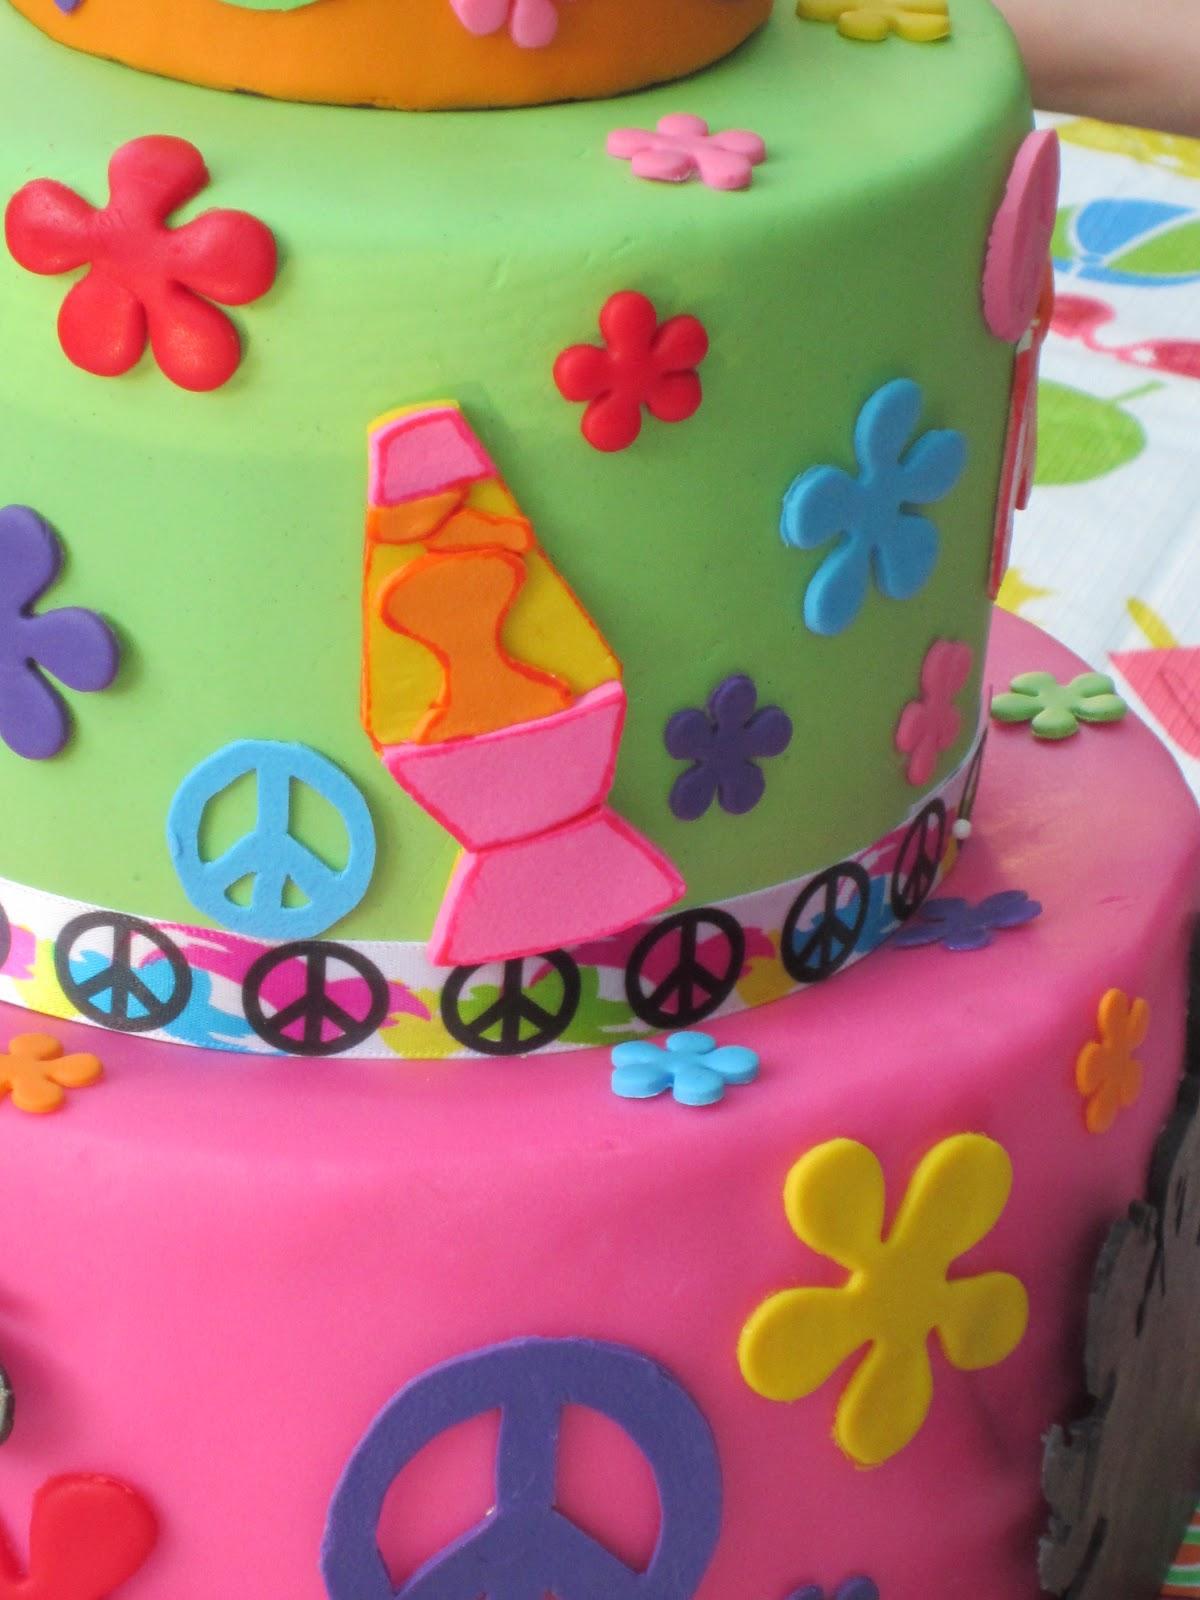 J's Cakes: 70s Birthday Cake